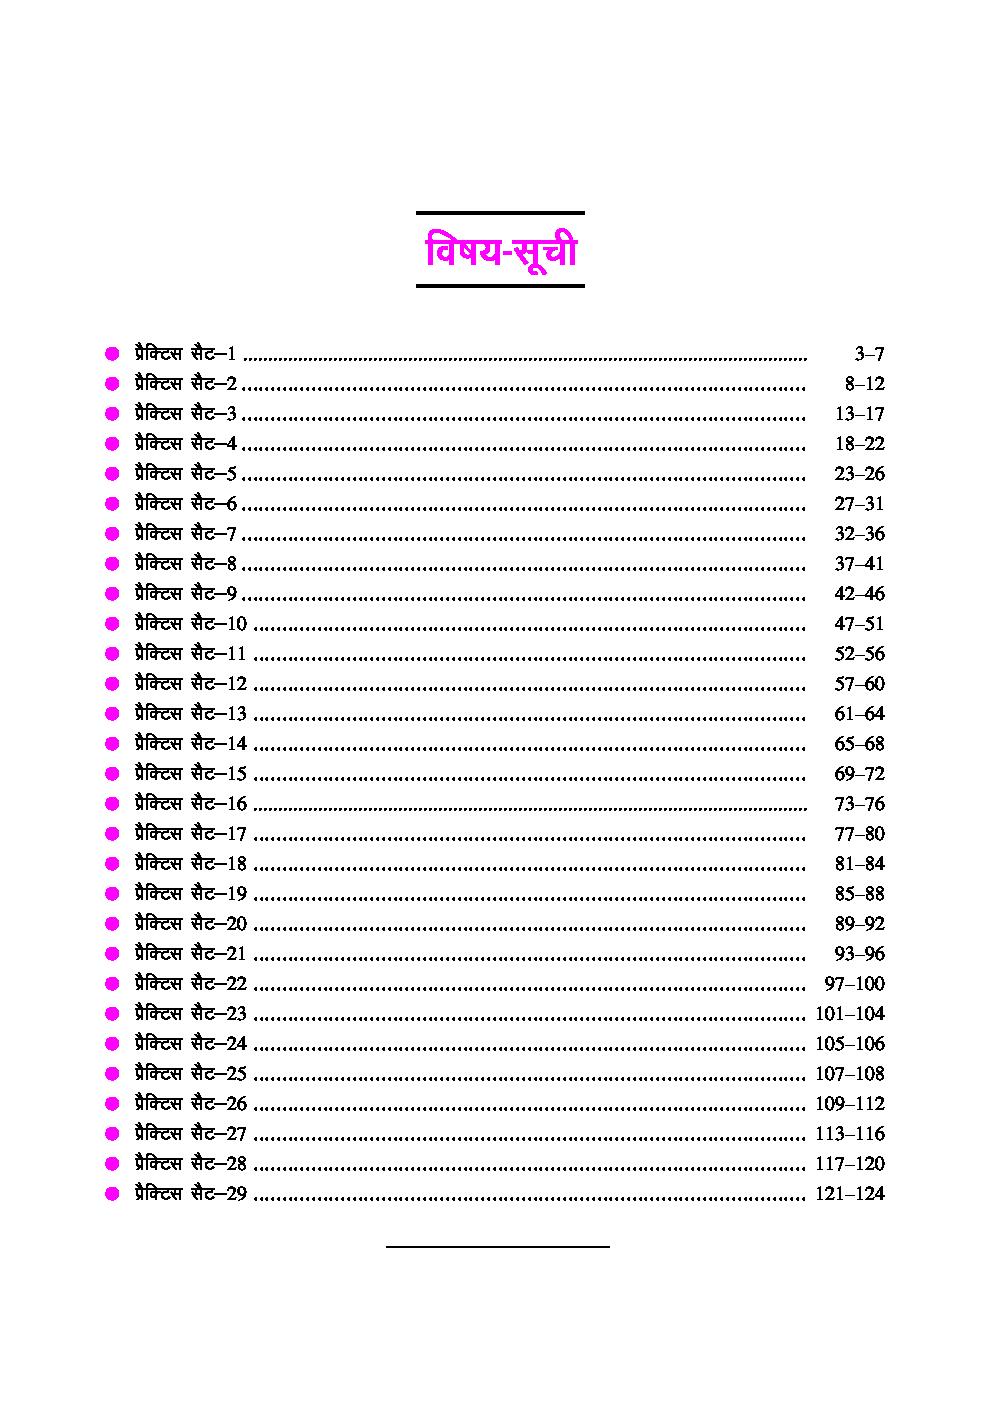 प्रैक्टिस सेट PGT /TGT कला - Page 4